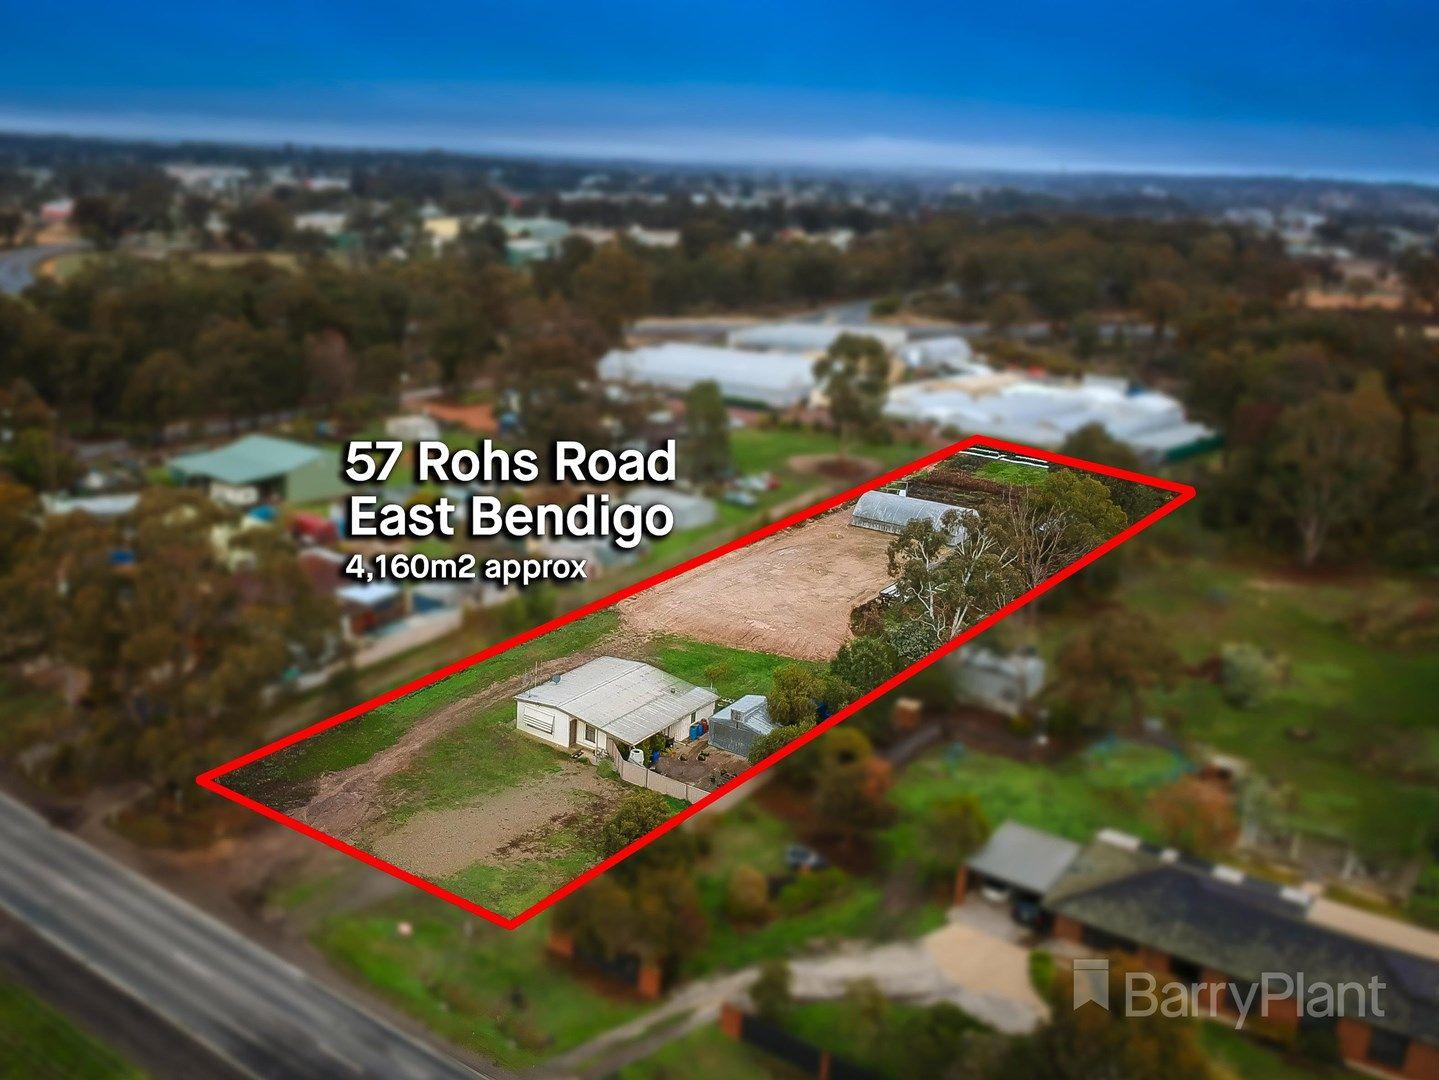 57 Rohs Road, East Bendigo VIC 3550, Image 0